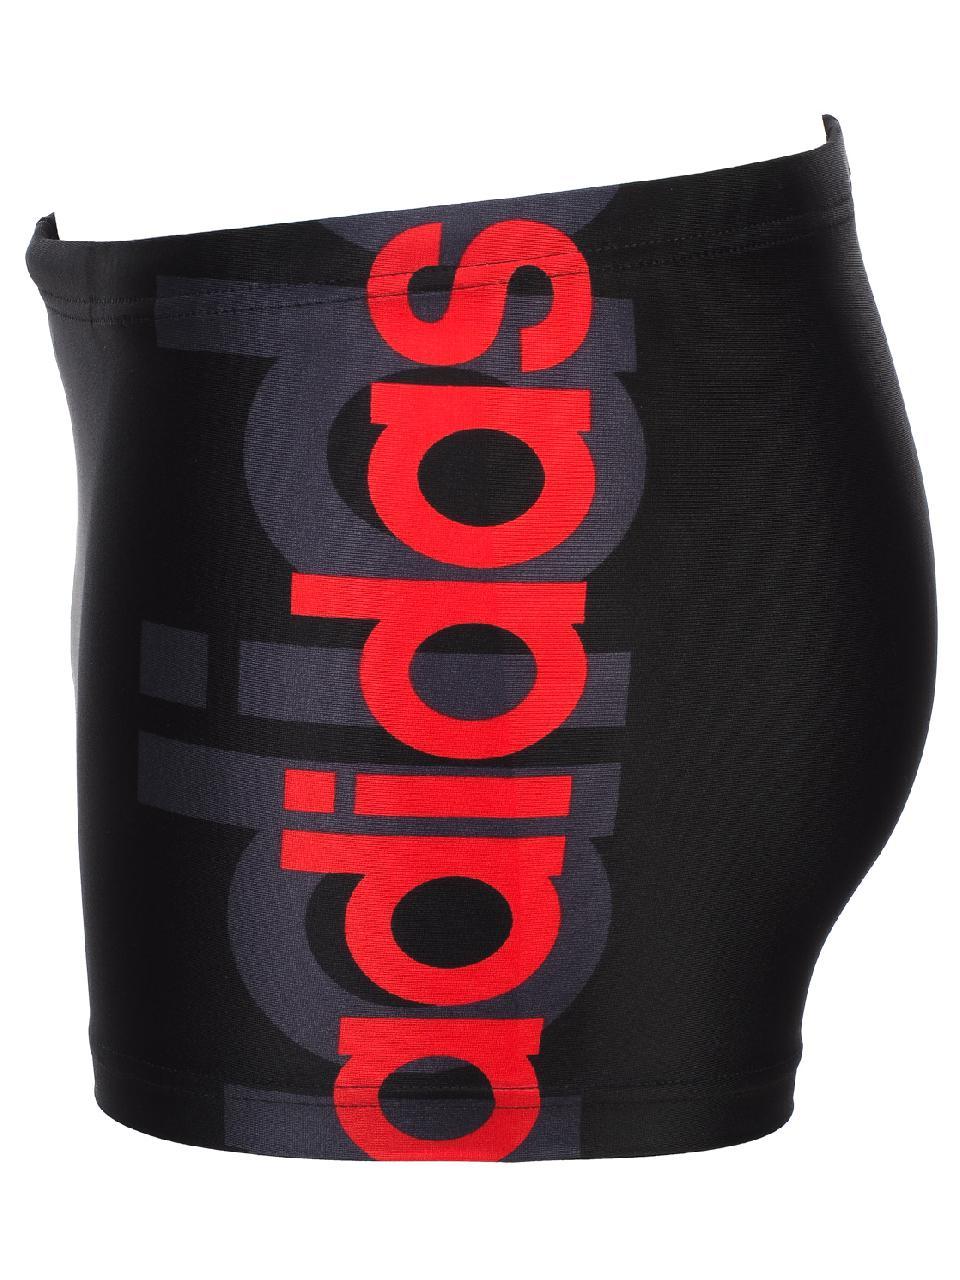 Boxer-Swimsuit-Adidas-Inf-Ecad-Bx-Black-Black-Boxer-57949-New thumbnail 2